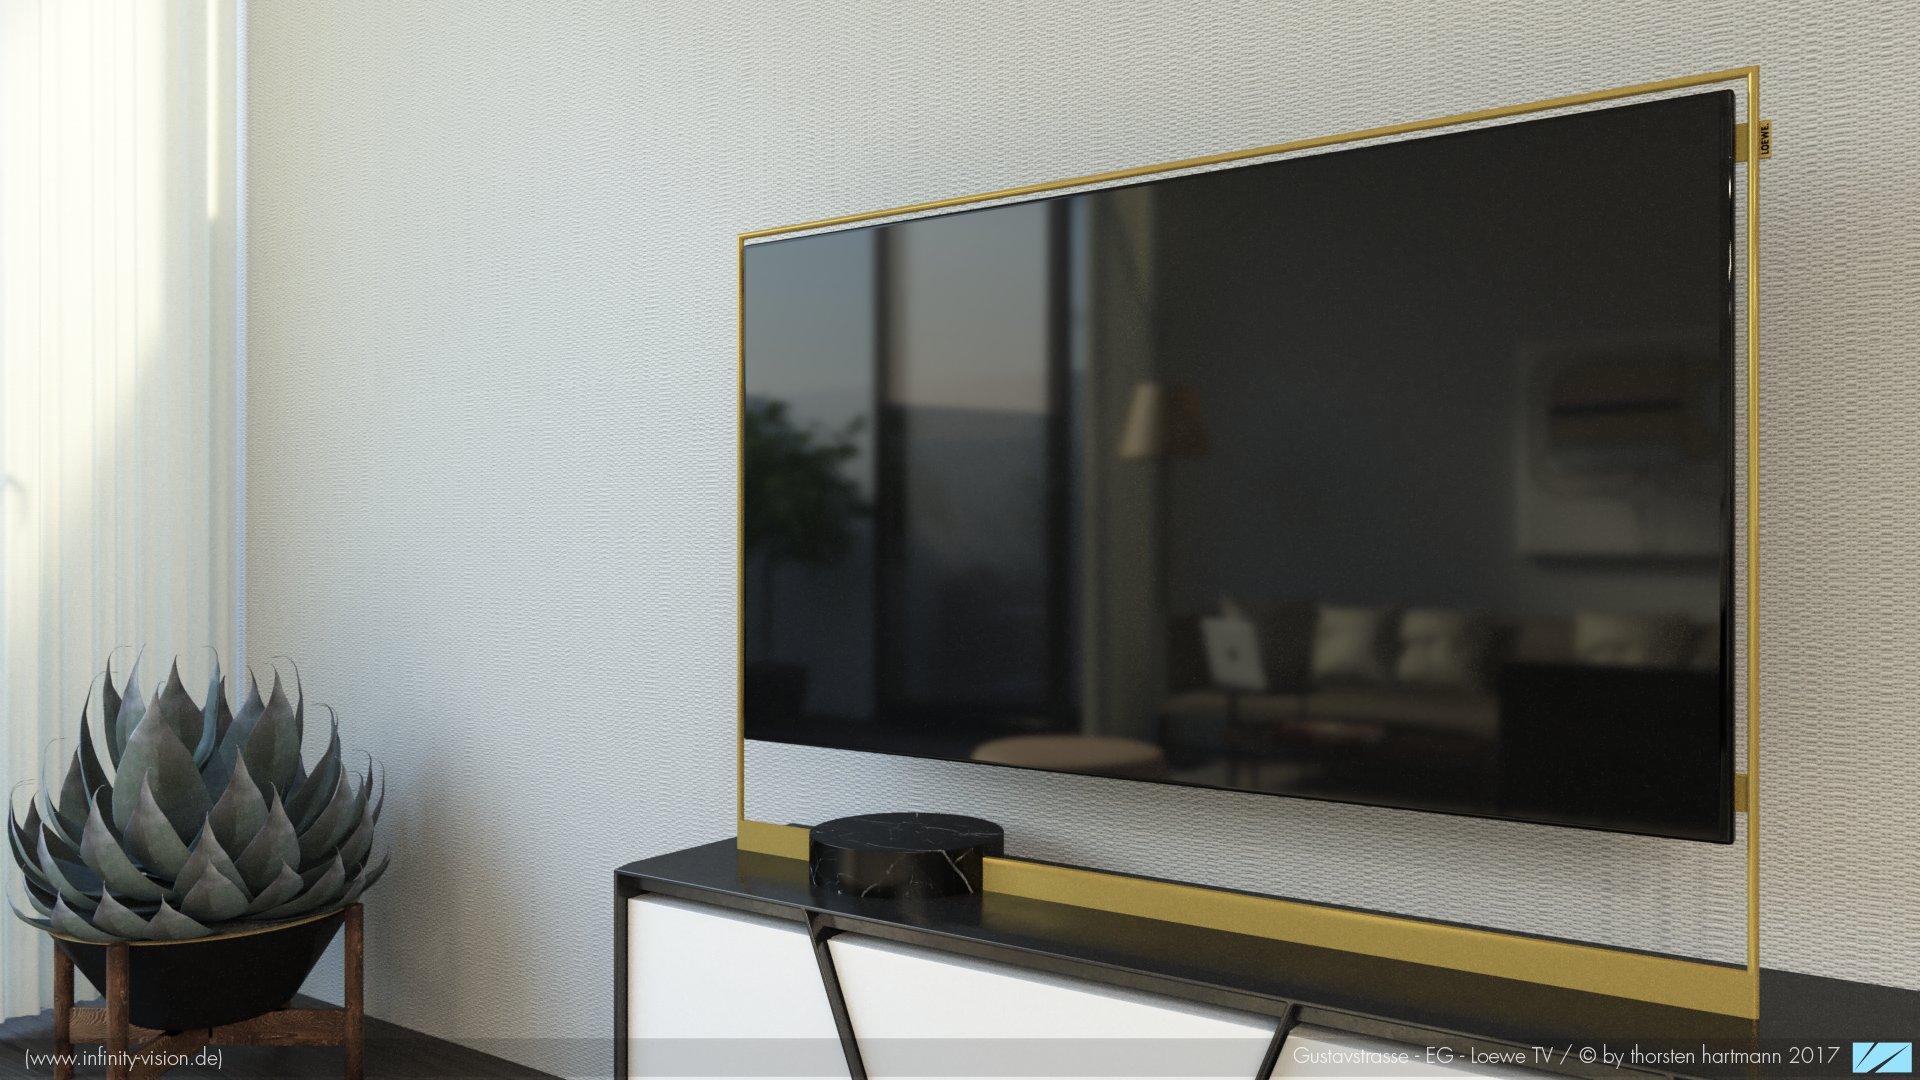 Gustavstrasse / Loewe TV